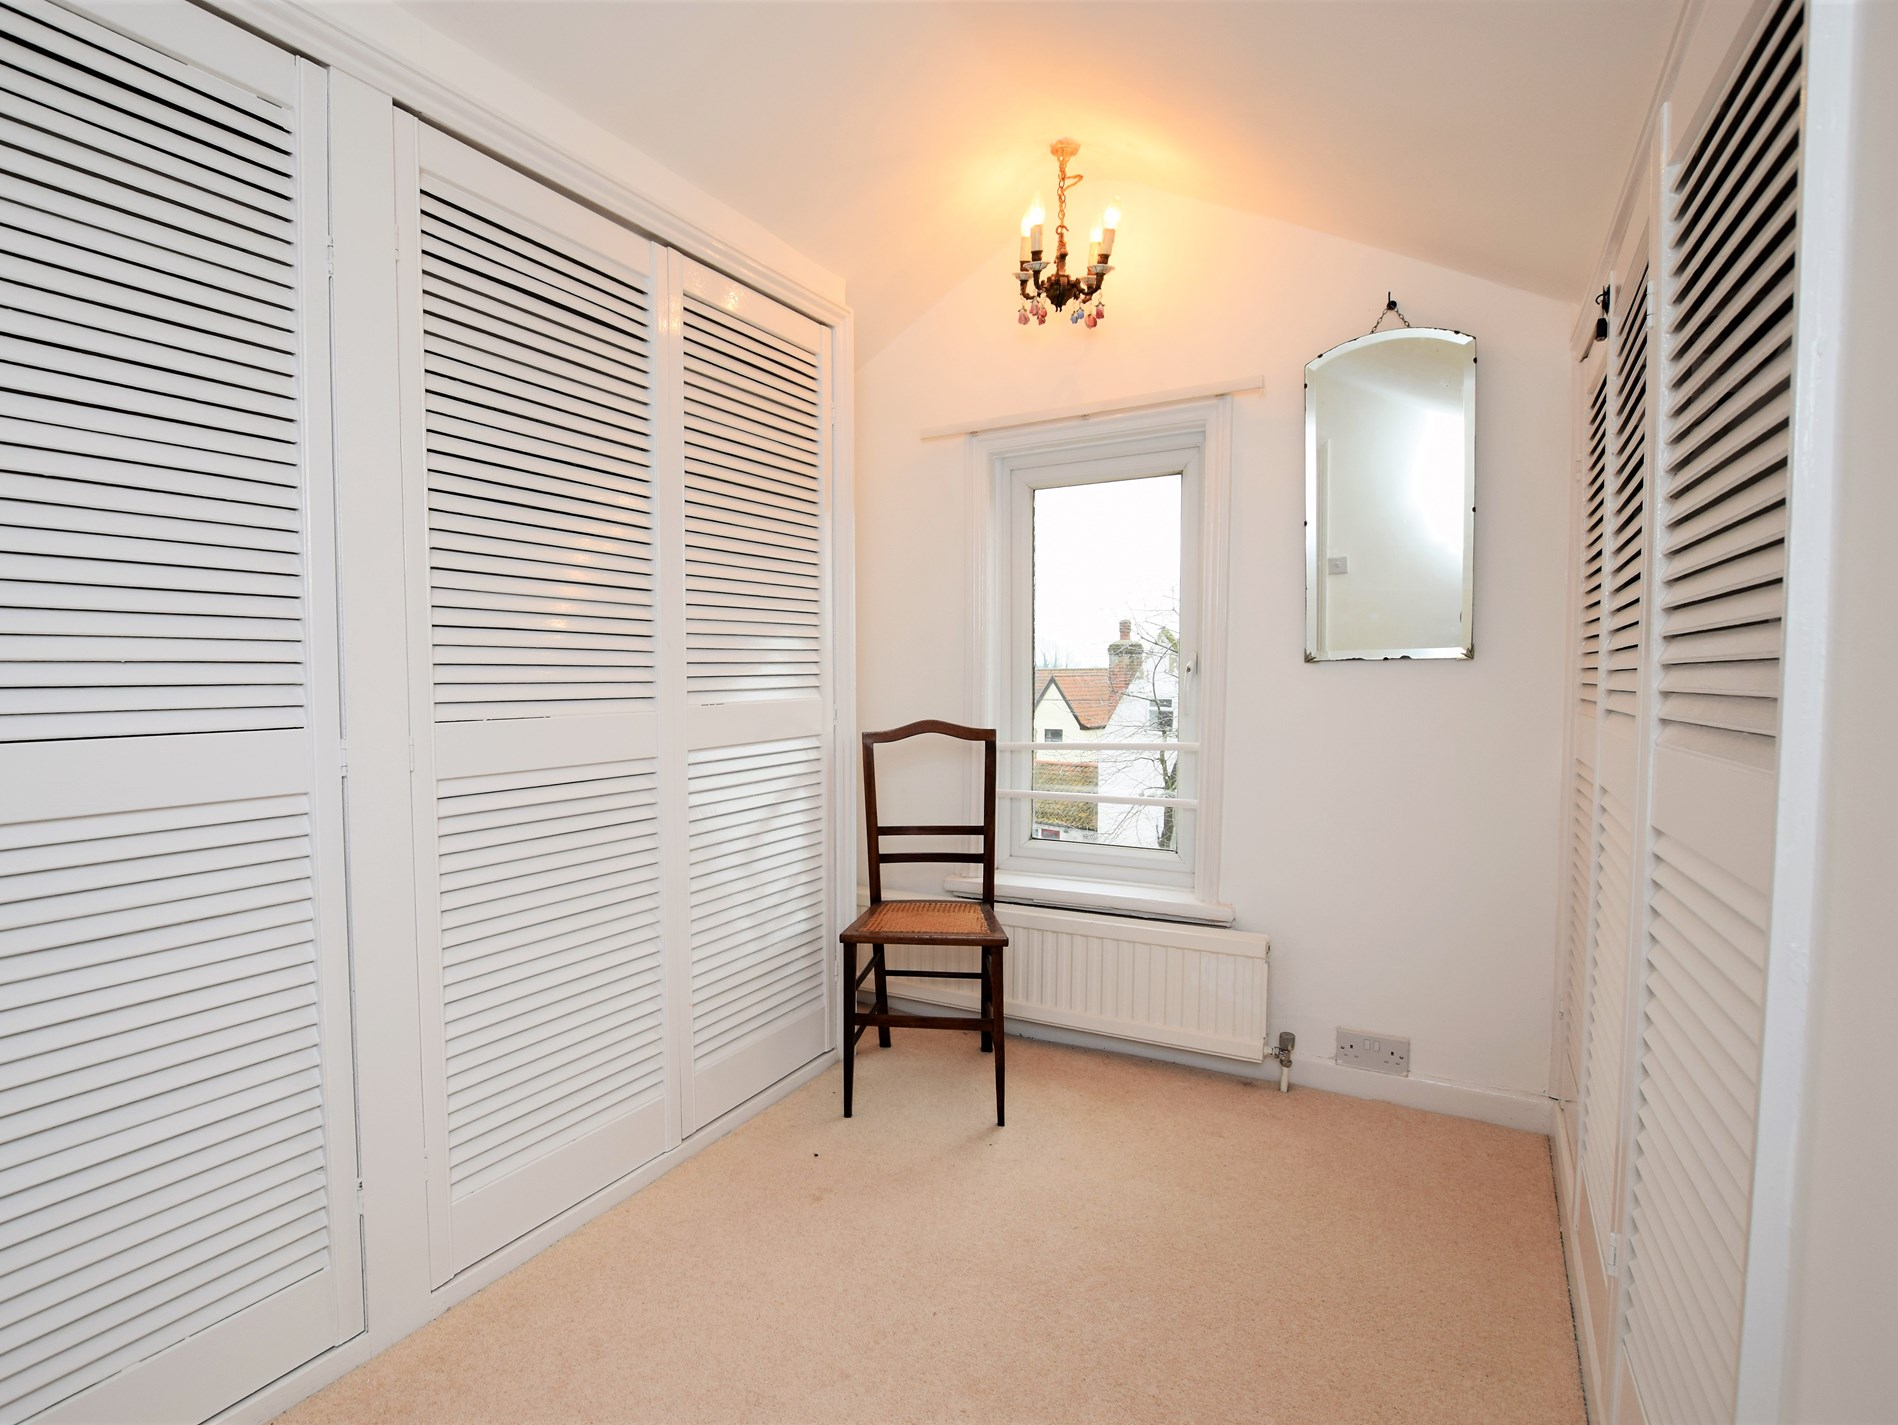 5 Bedroom Cottage in Norfolk, East Anglia